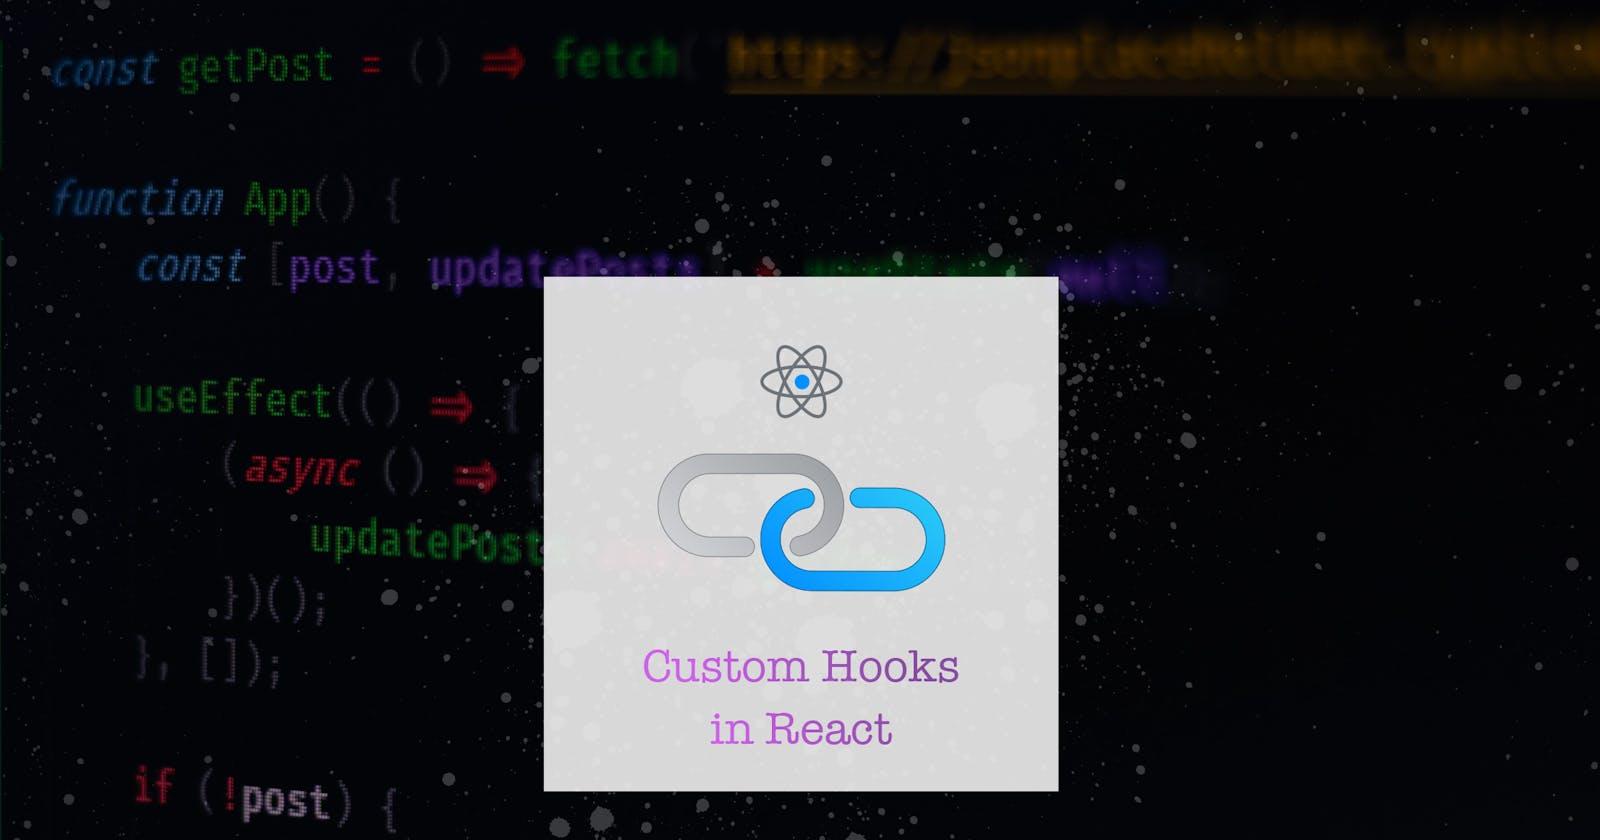 ReactJS: A Simple Custom Hook